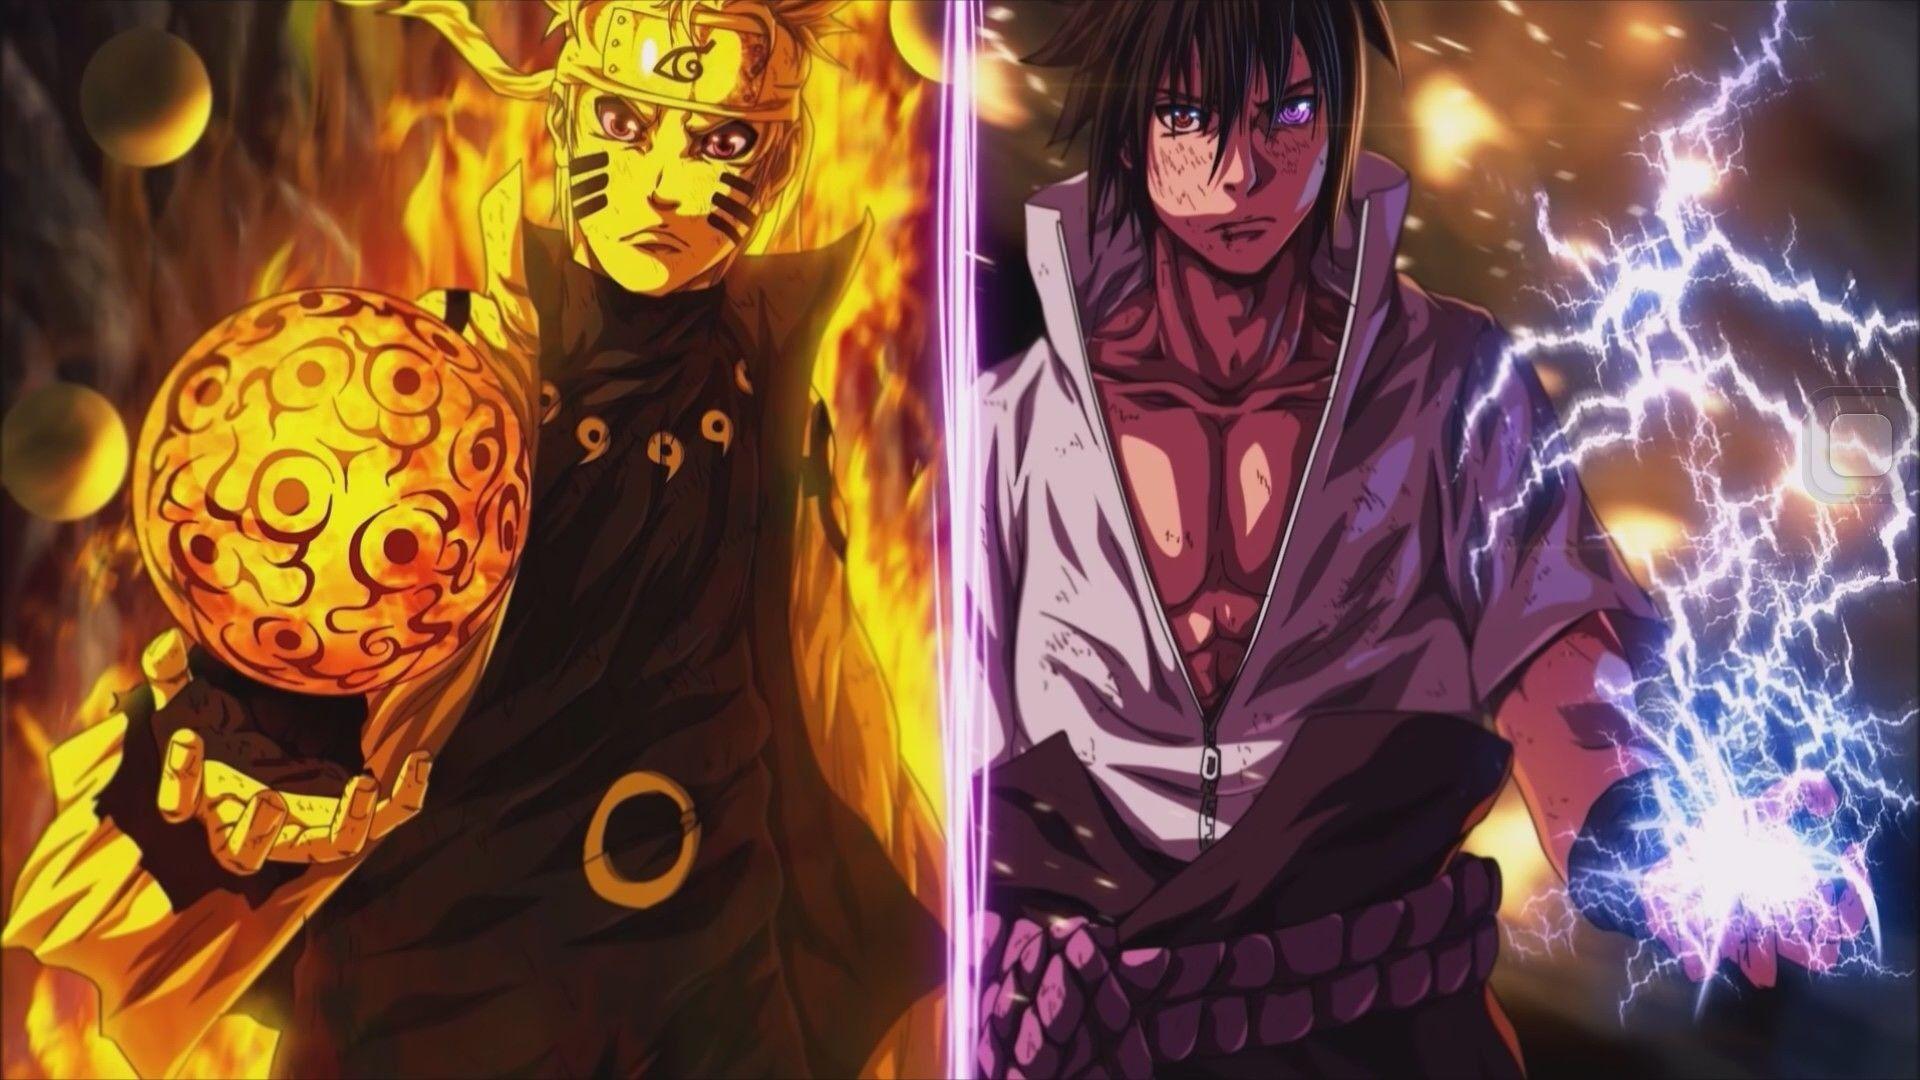 Epingle Par Csirp Sur Dessin En 2020 Naruto Et Sasuke Fond D Ecran Telephone Manga Naruto